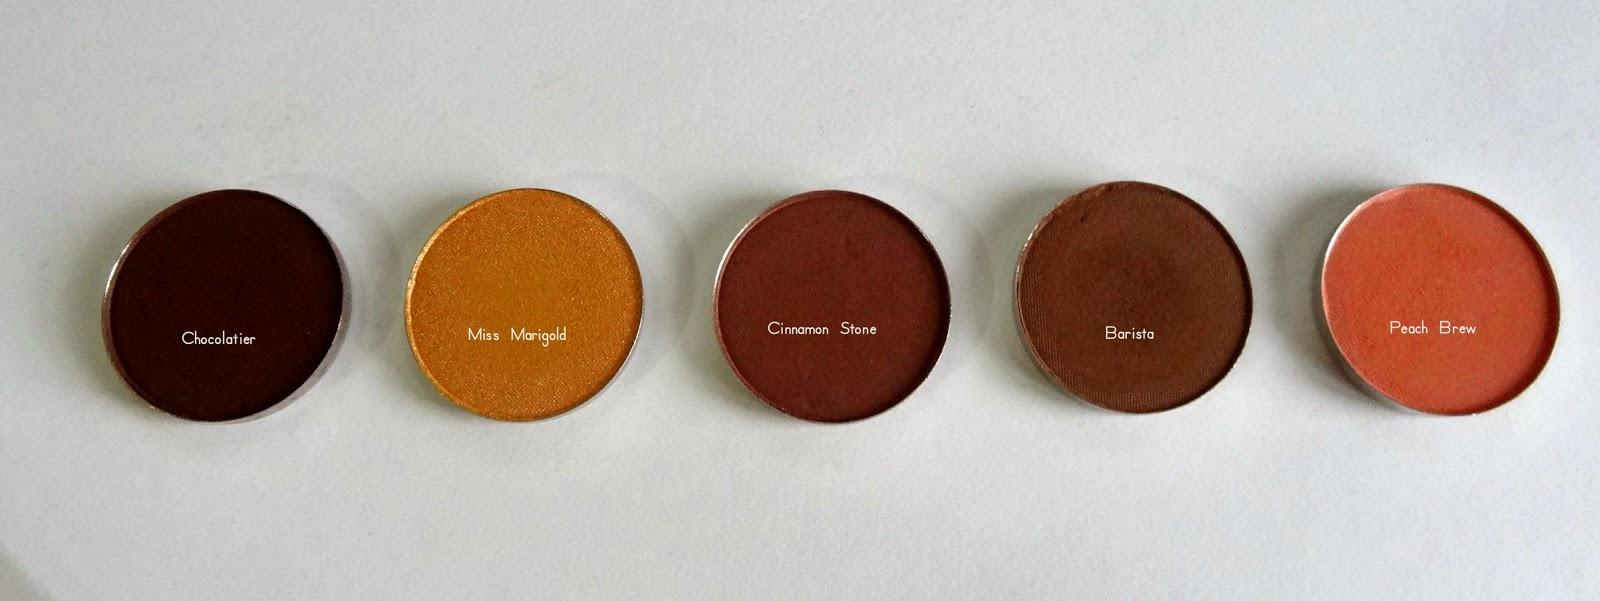 coastal scents hot pots haul Chocolatier,Miss Marigold,Cinnamon Stone,Barista,Peach Brew